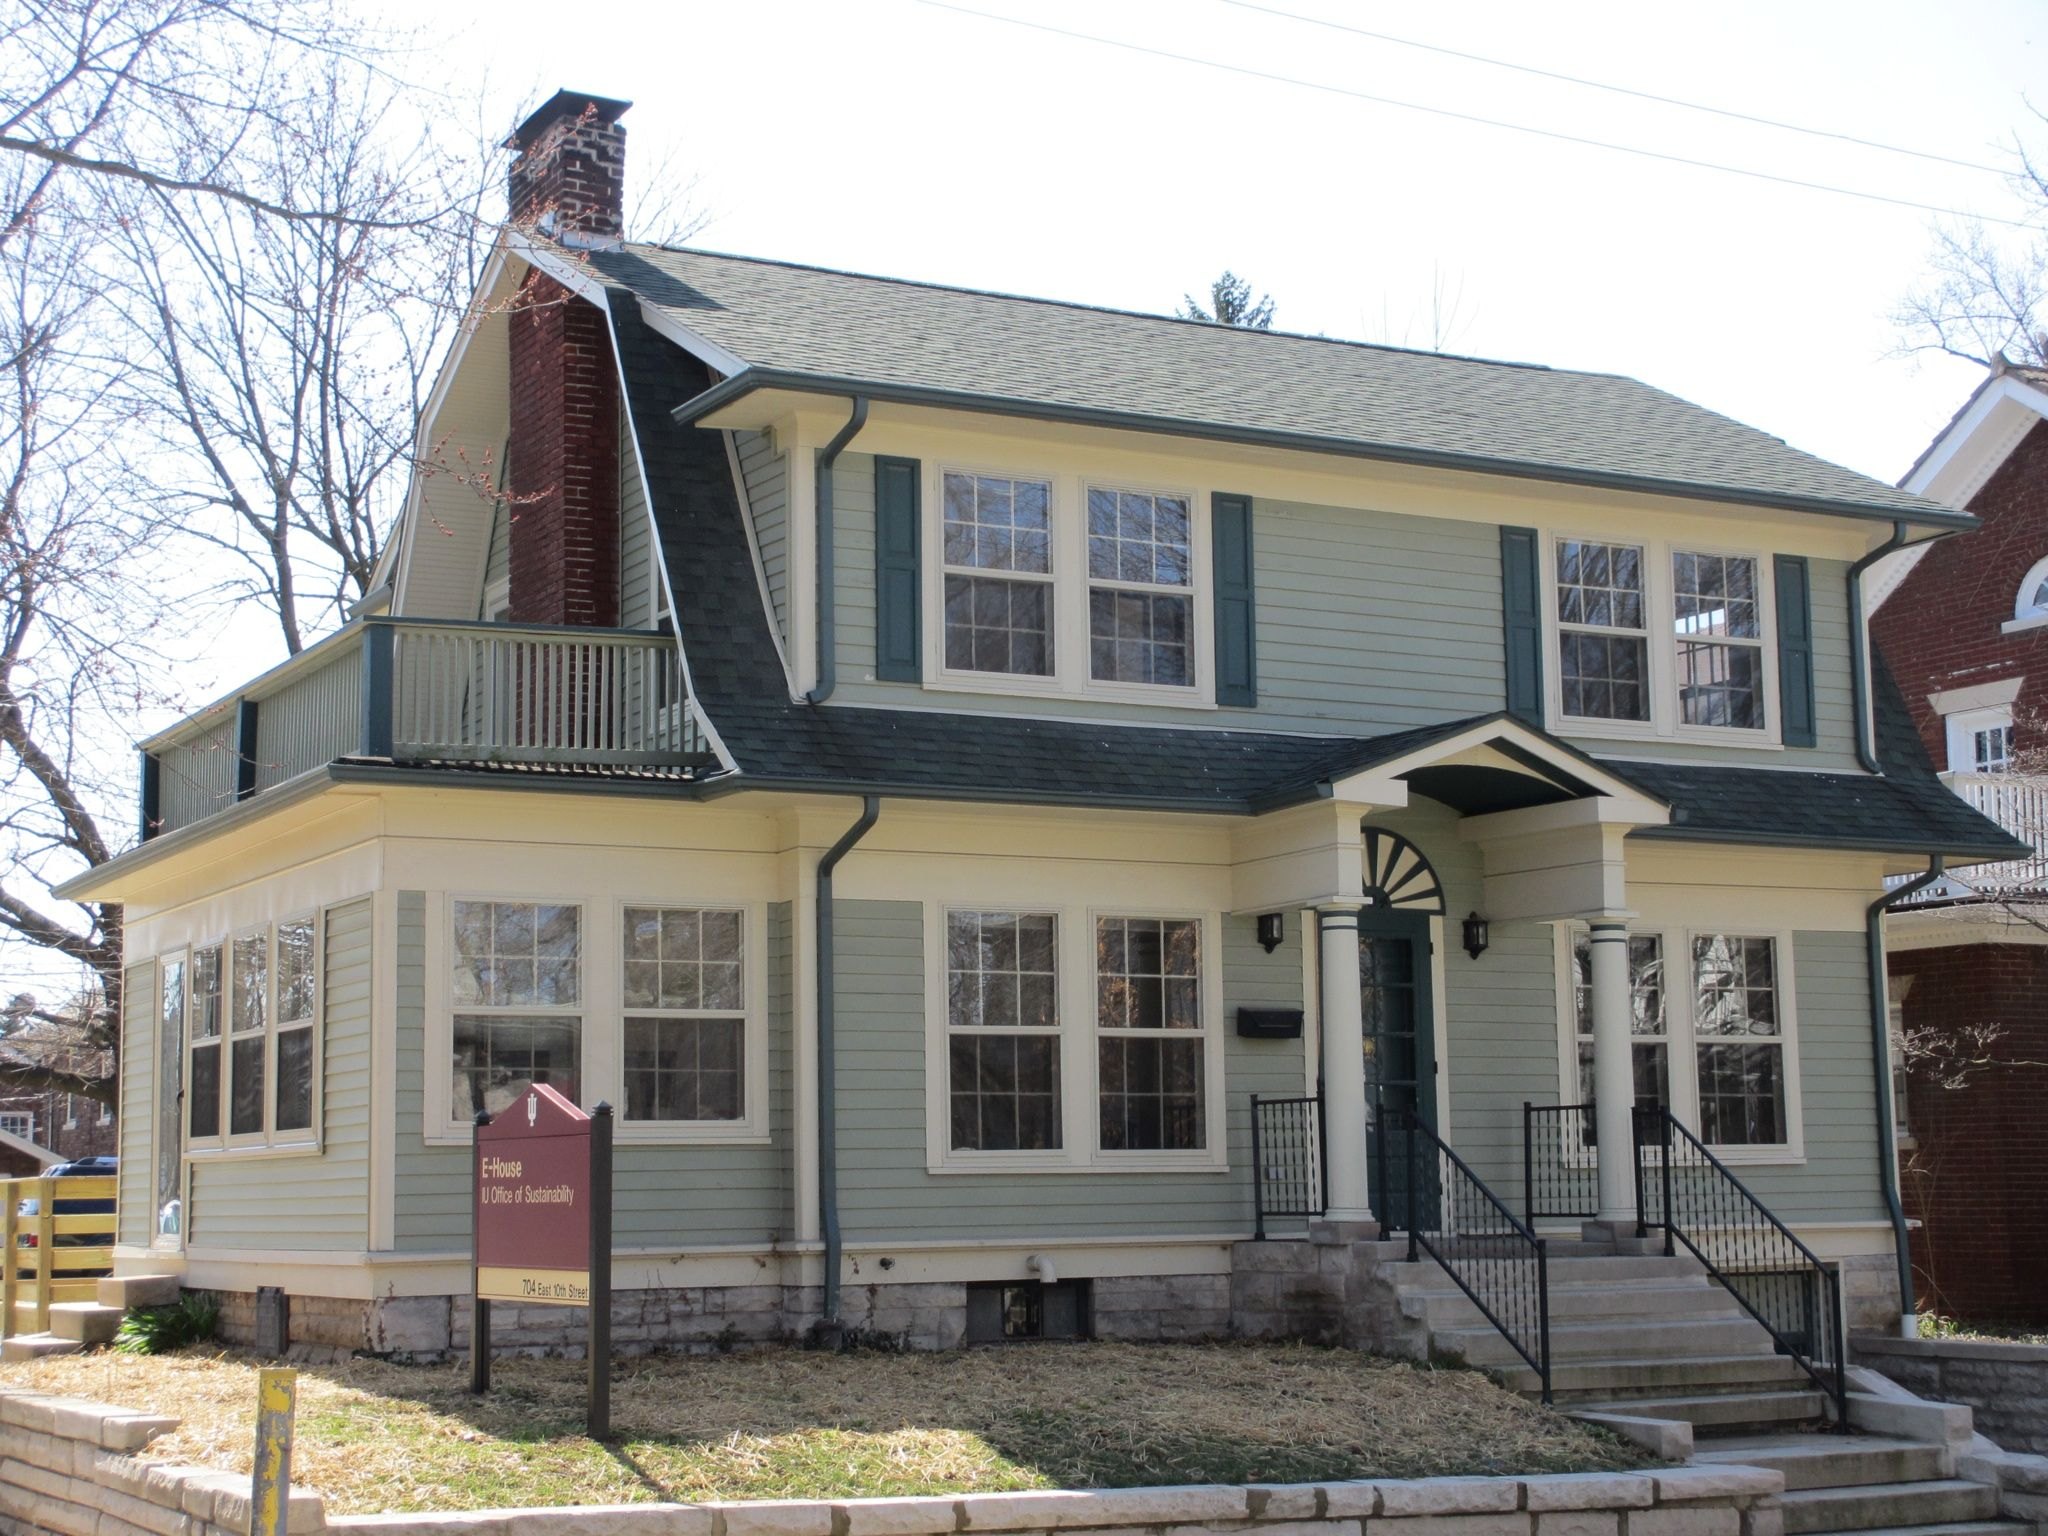 Dutch Colonial Homes 10th St E House Is A 1930s Dutch Colonial Revival